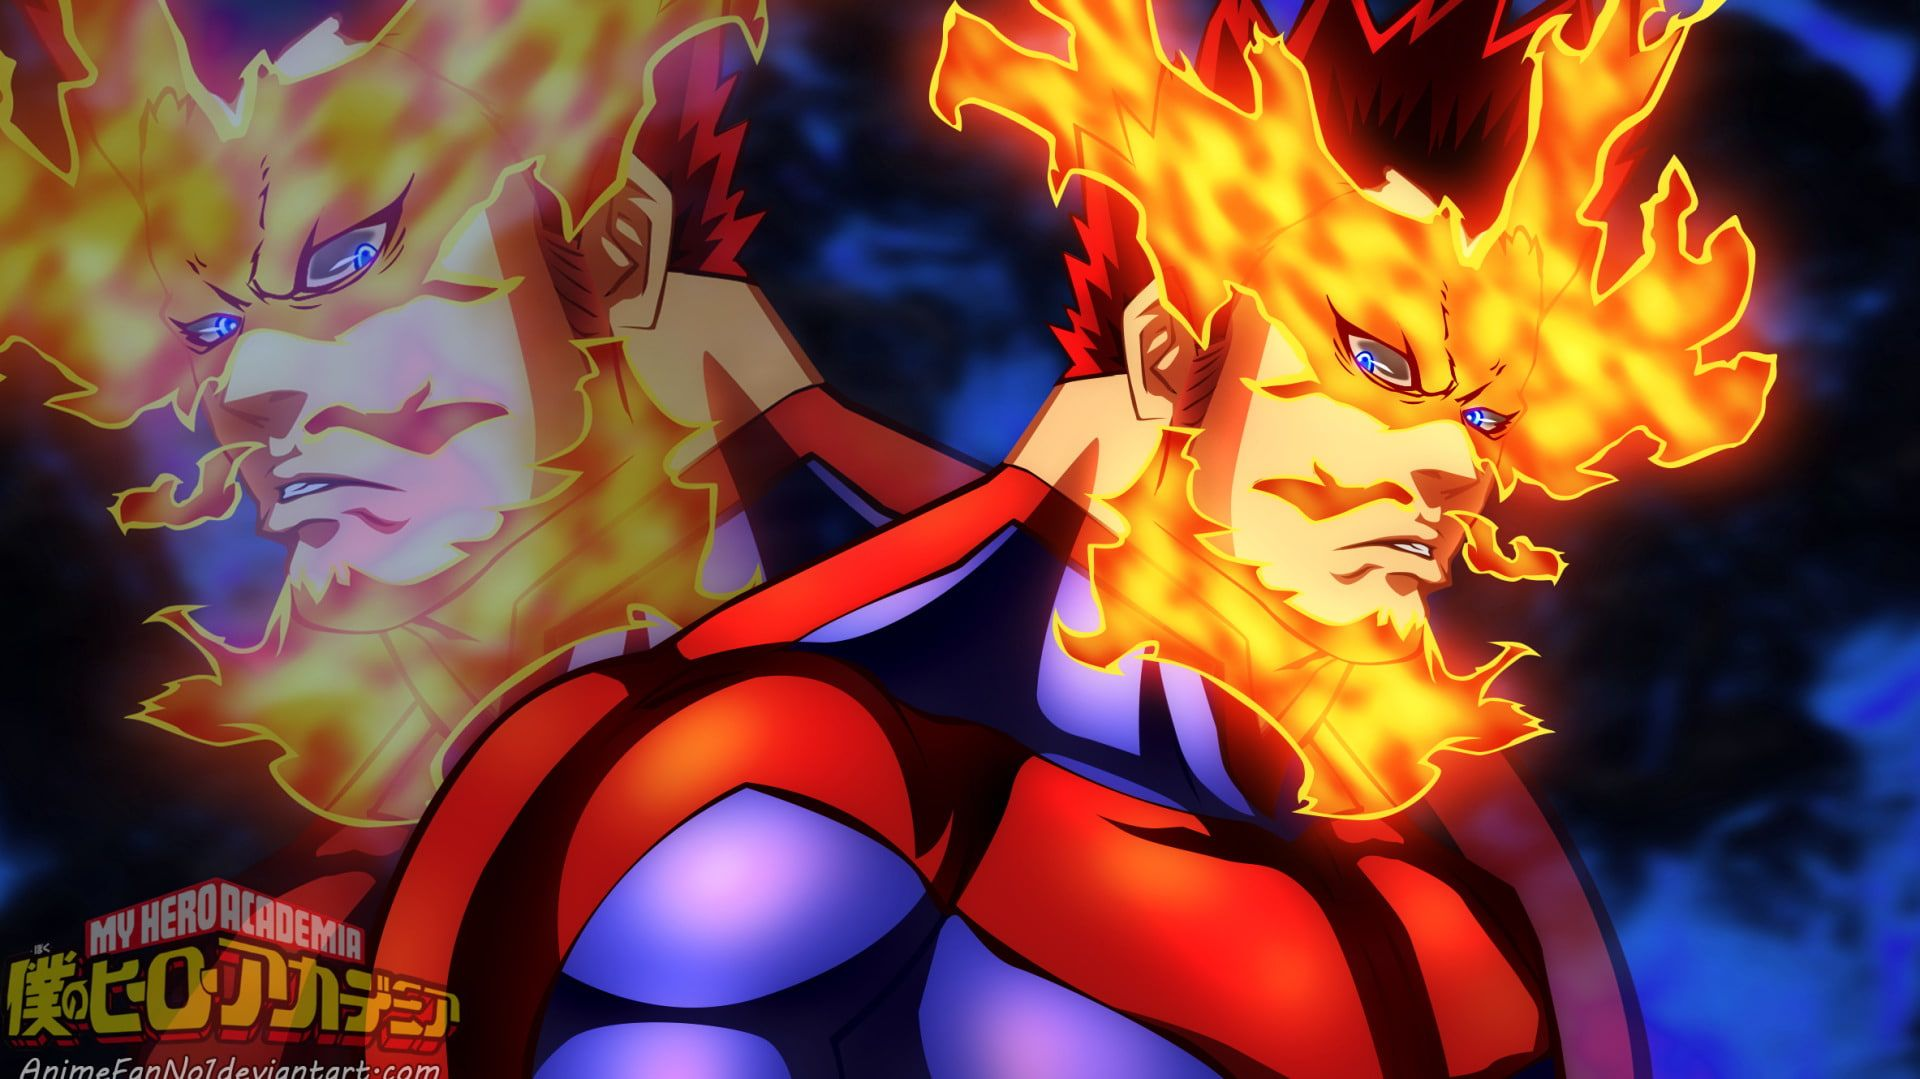 Anime My Hero Academia Endeavor Boku No Hero Academia 1080p Wallpaper Hdwallpaper Desktop My Hero Academia My Hero Hero